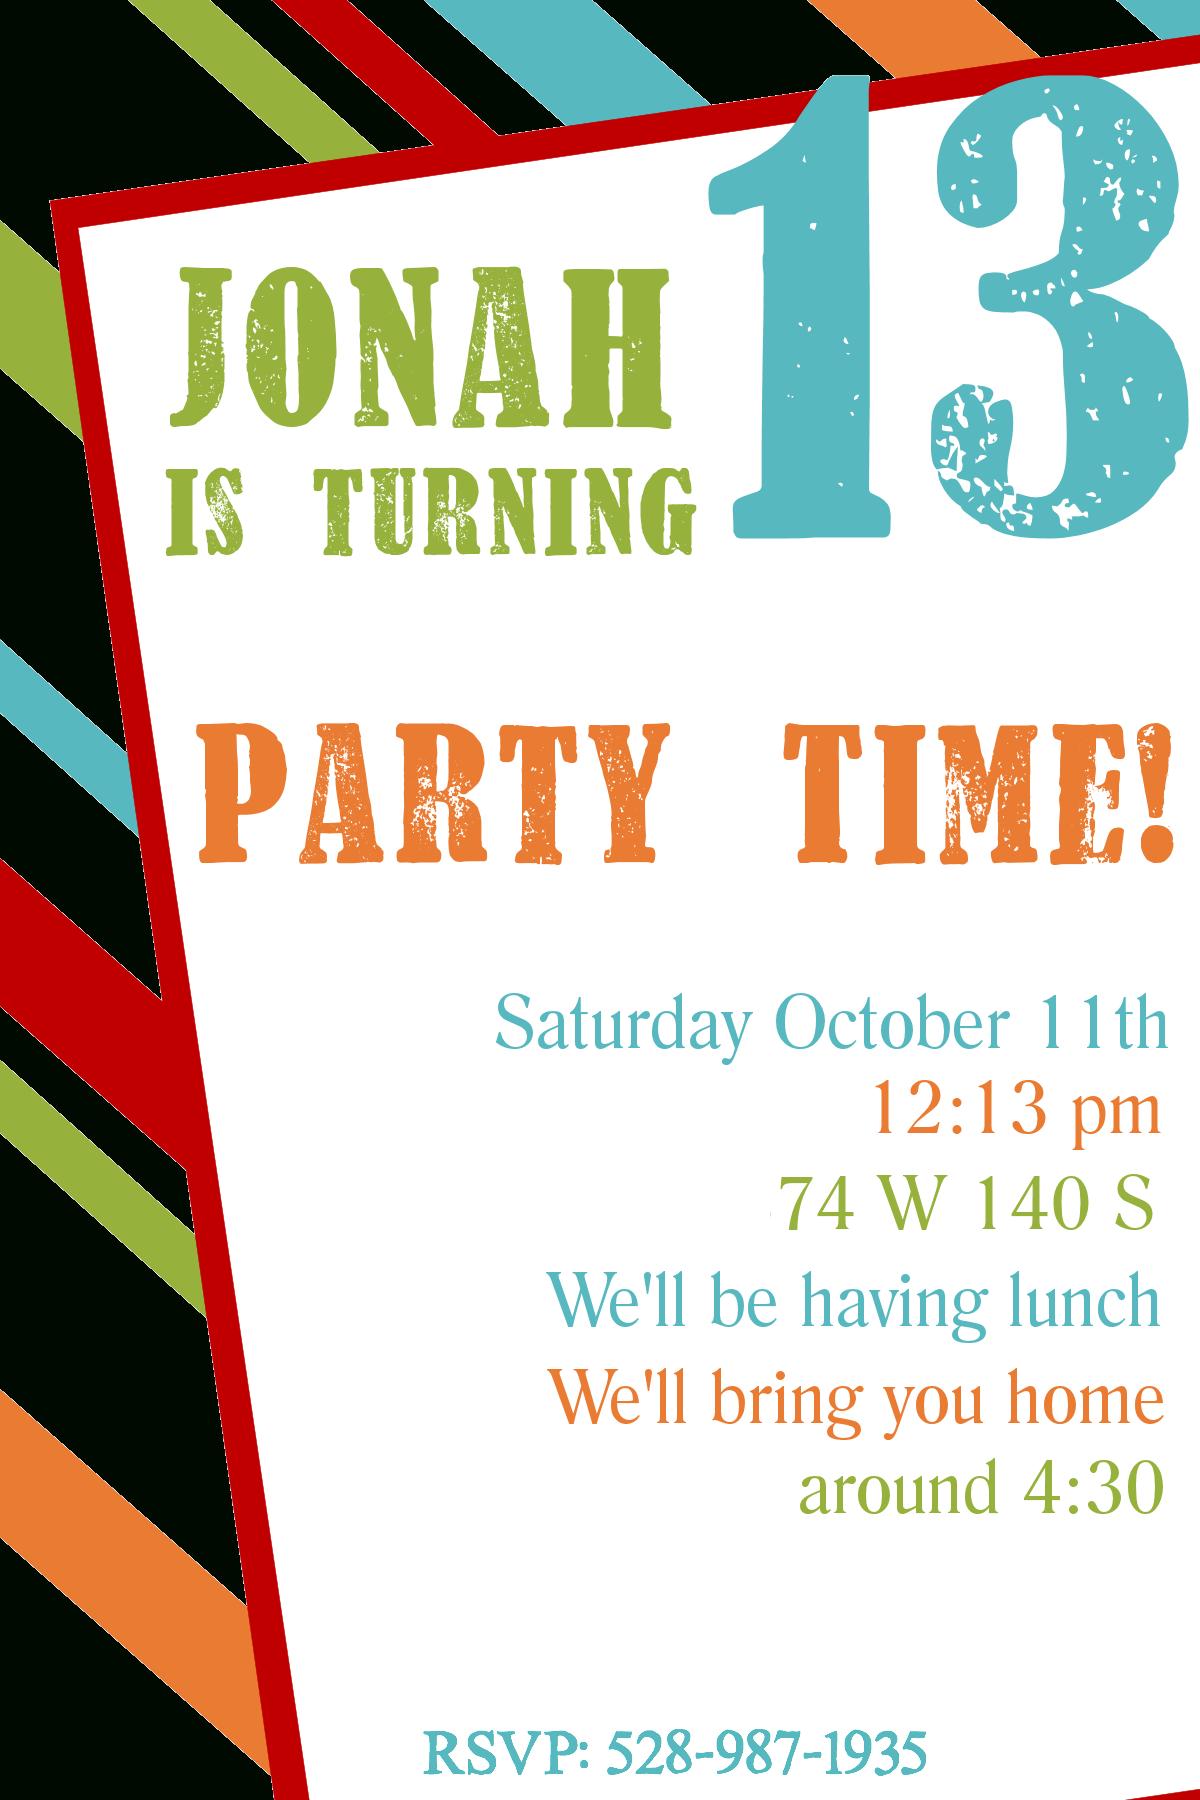 Free Printable Birthday Invitation Templates - Free Printable Birthday Invitations